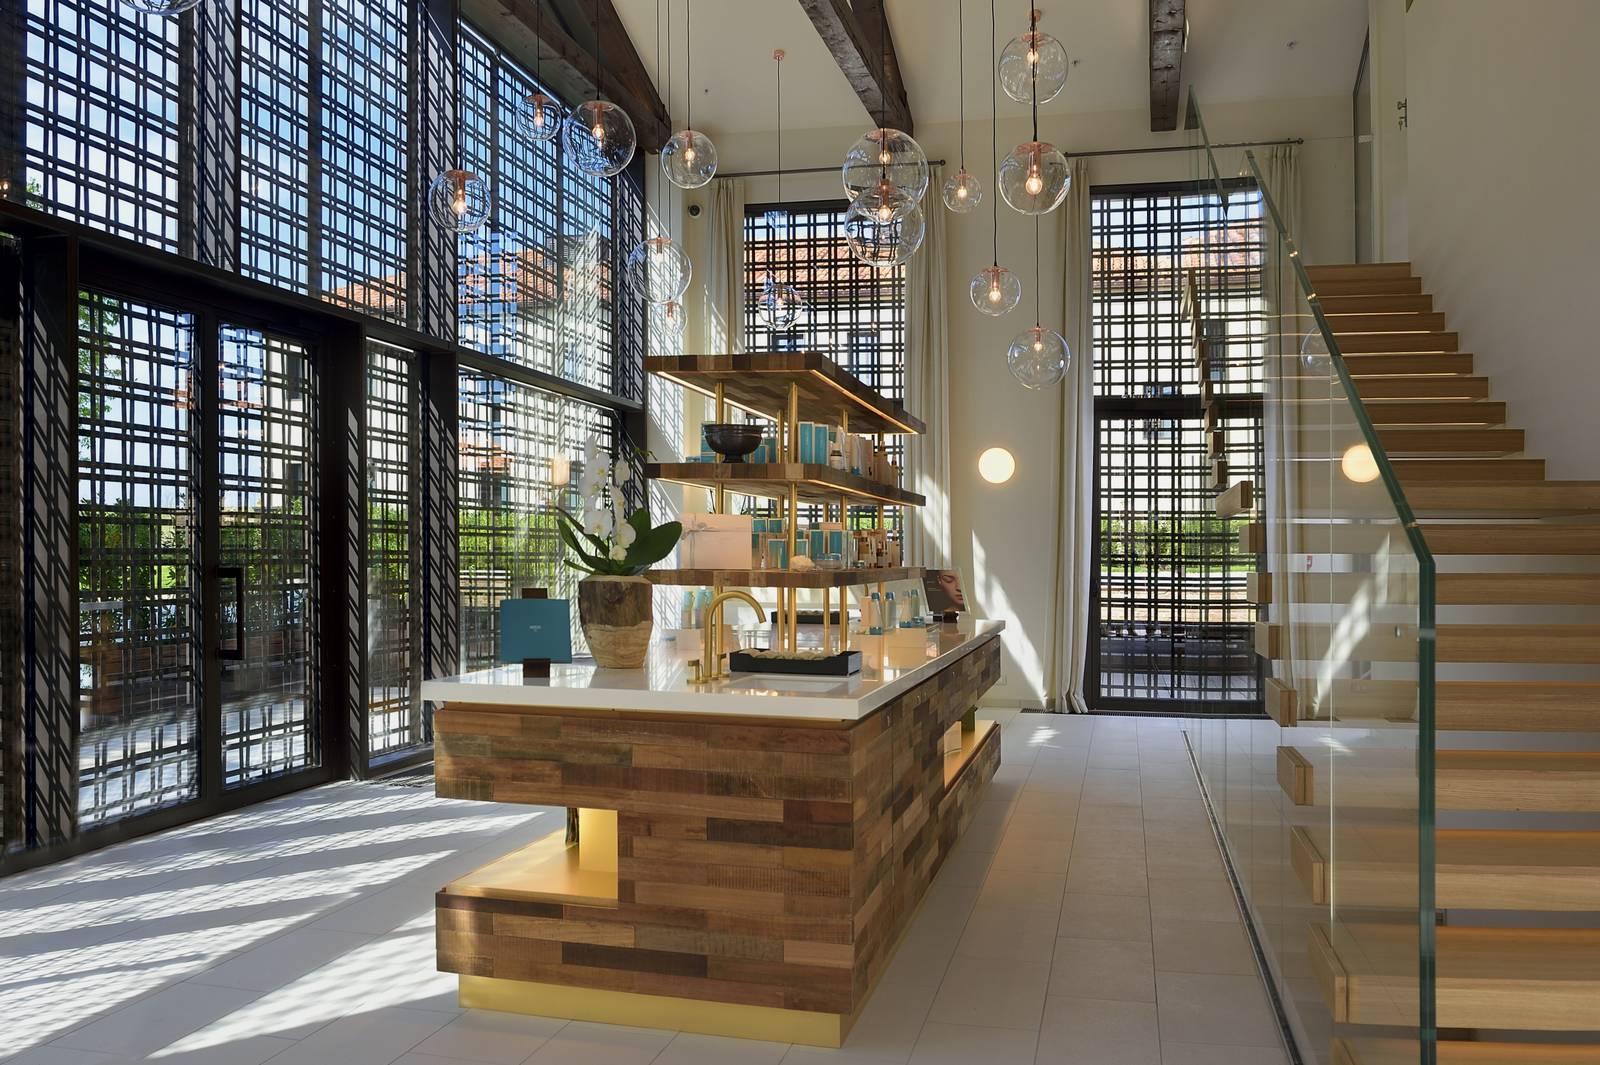 Jw marriott venice resort spa review gtspirit for Hotel design venice